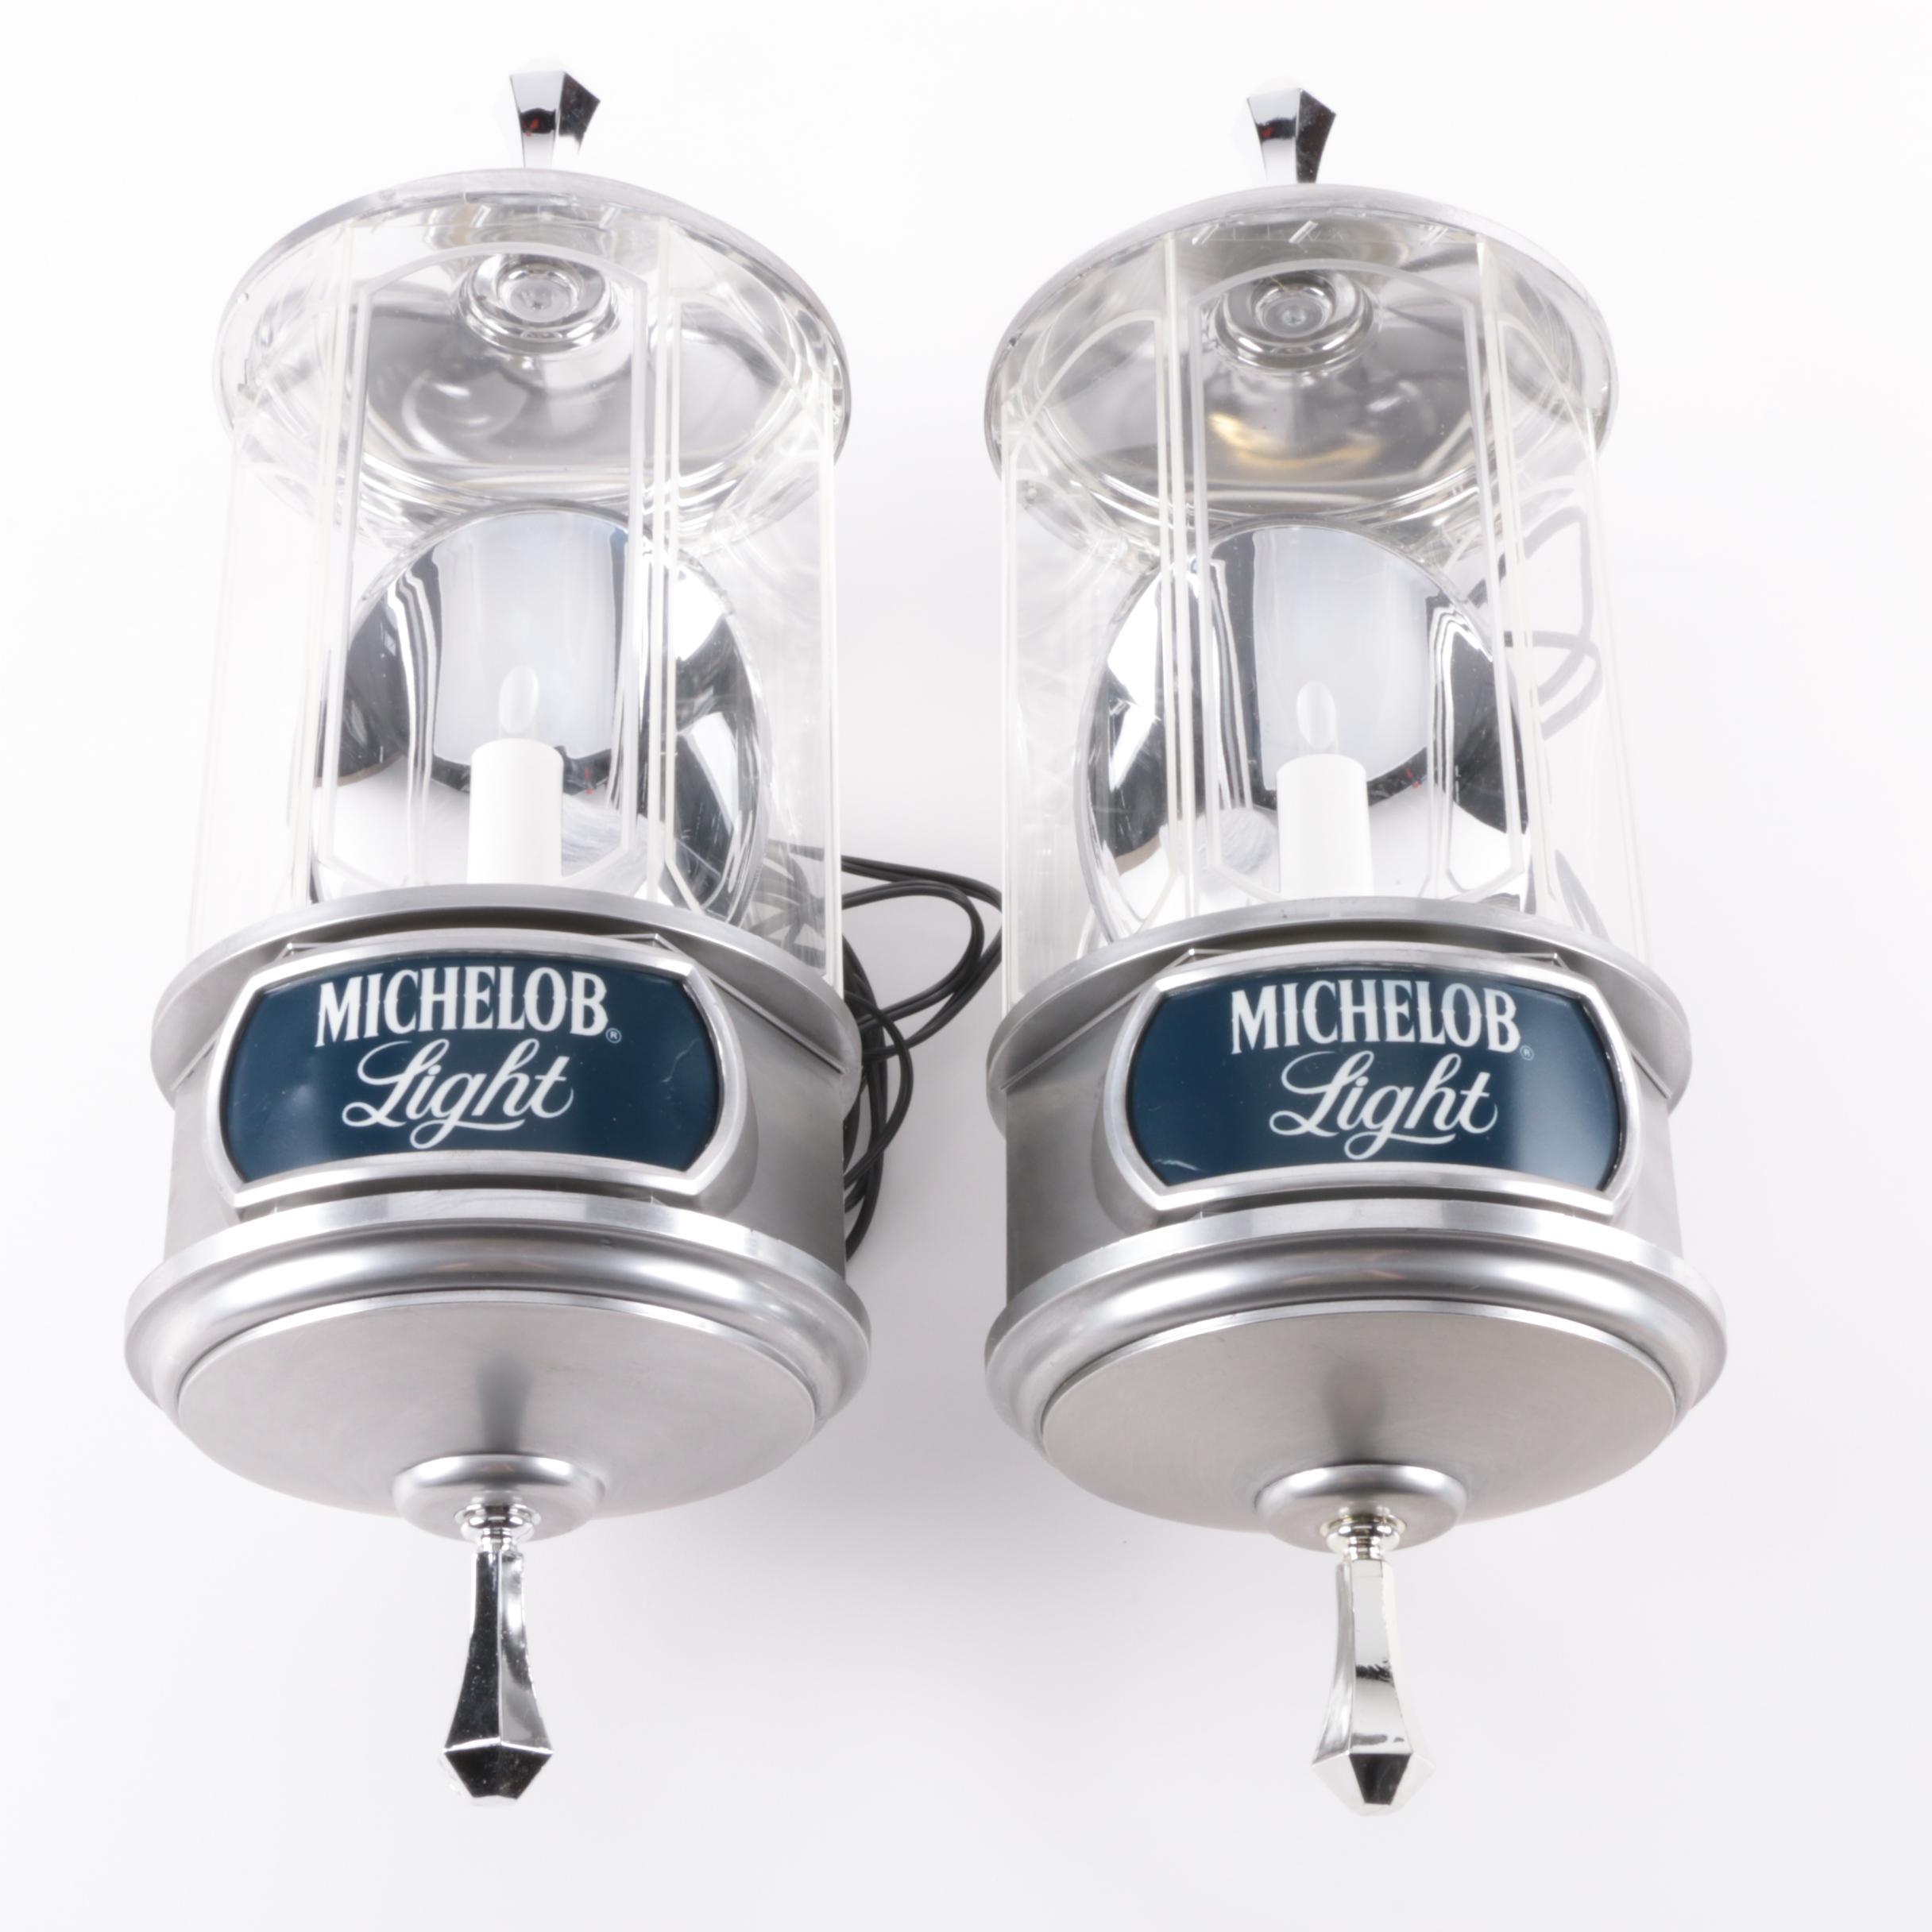 Vintage Michelob Light Beer Wall Light Fixtures